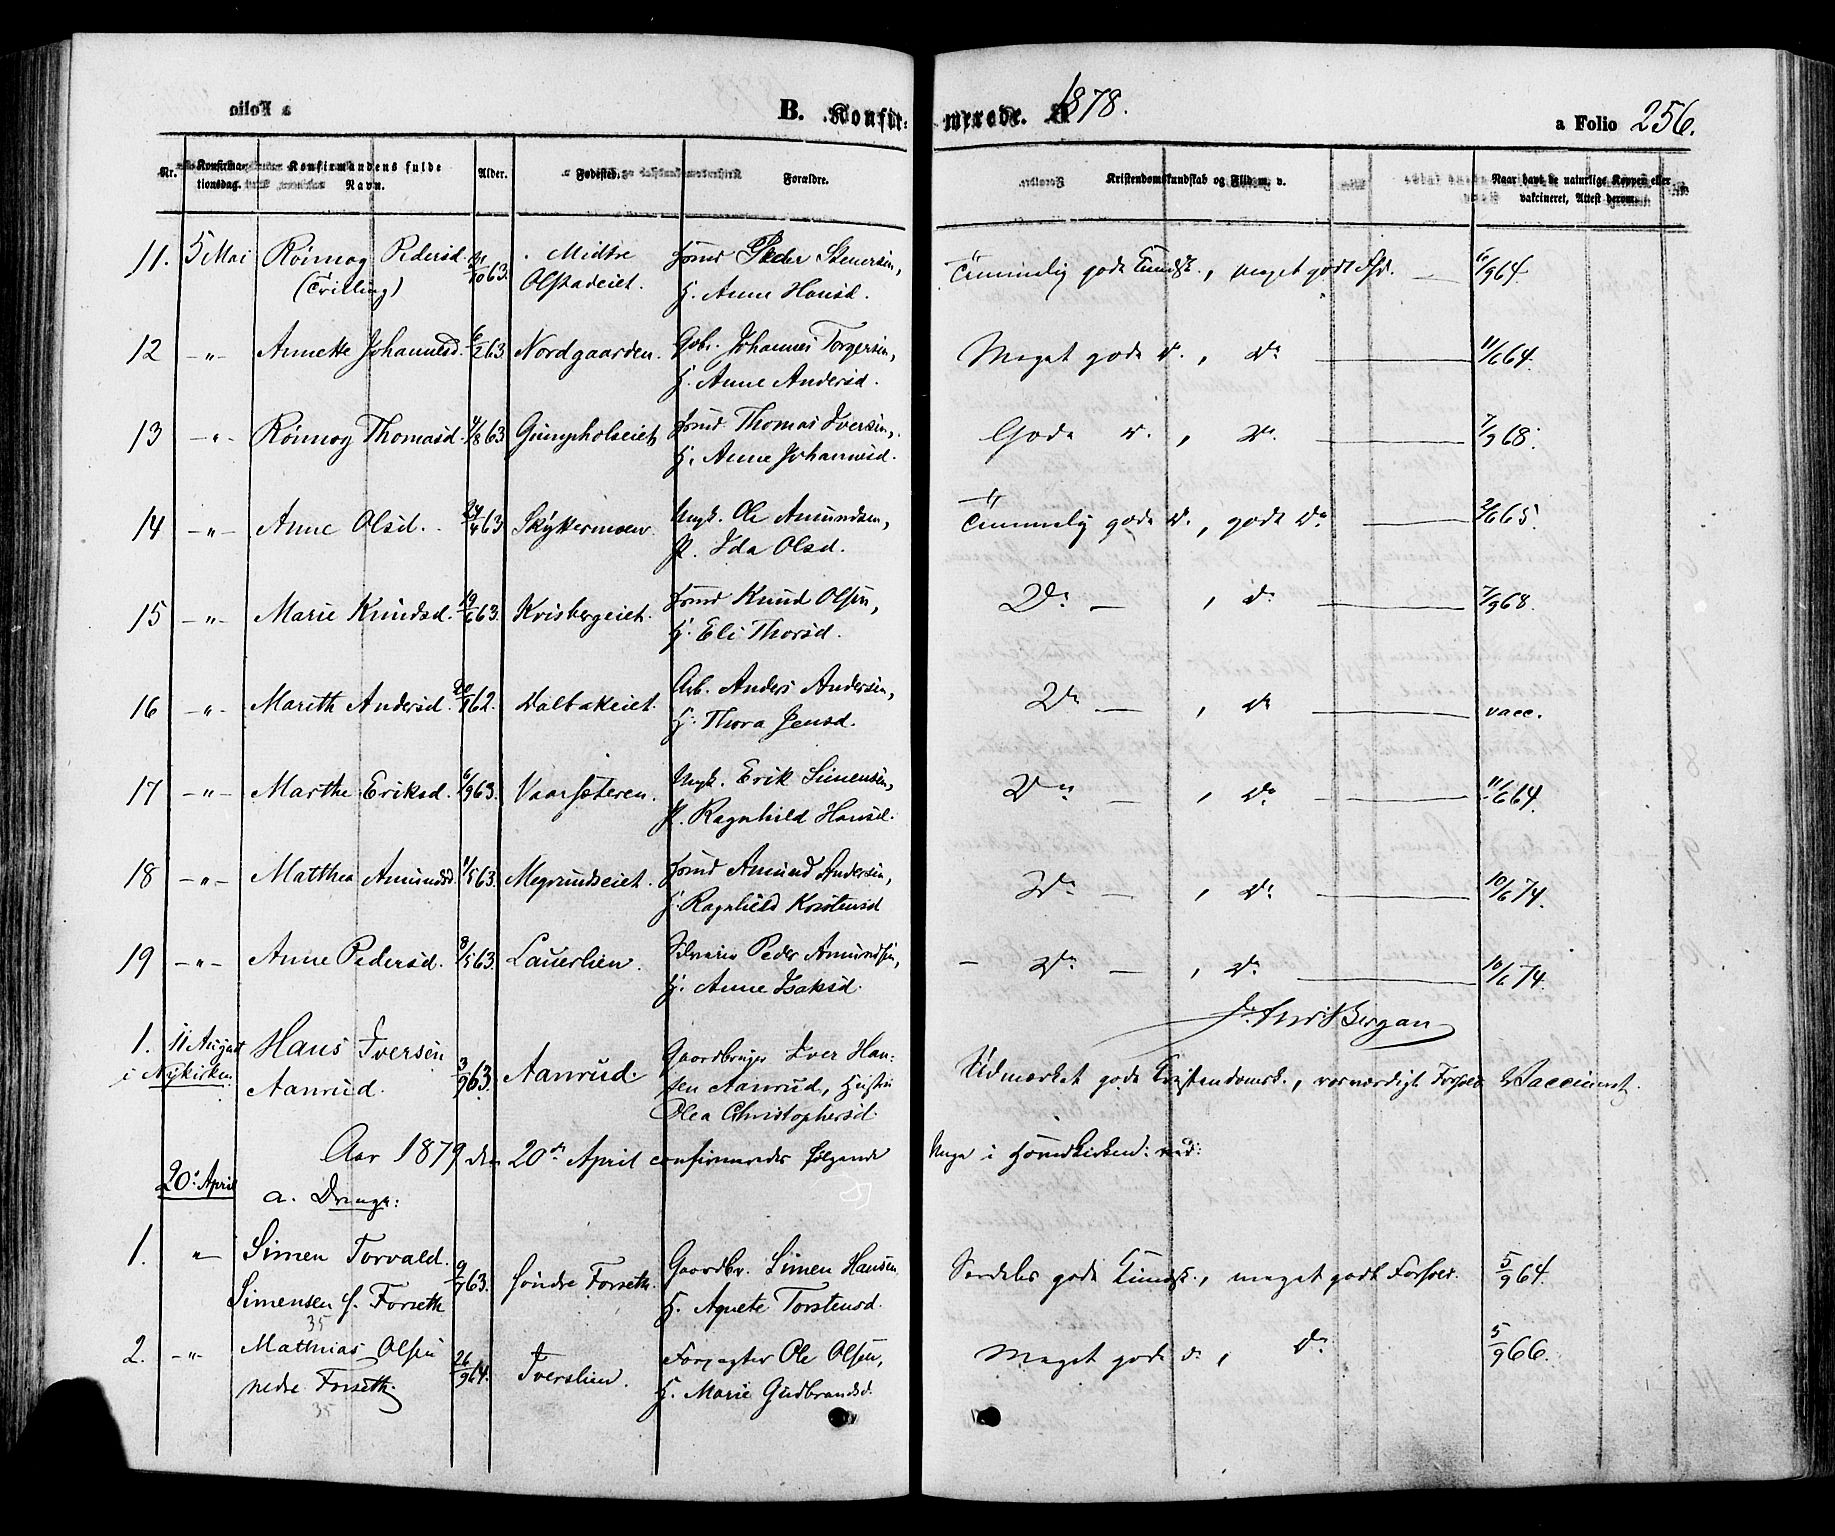 SAH, Gausdal prestekontor, Ministerialbok nr. 10, 1867-1886, s. 256